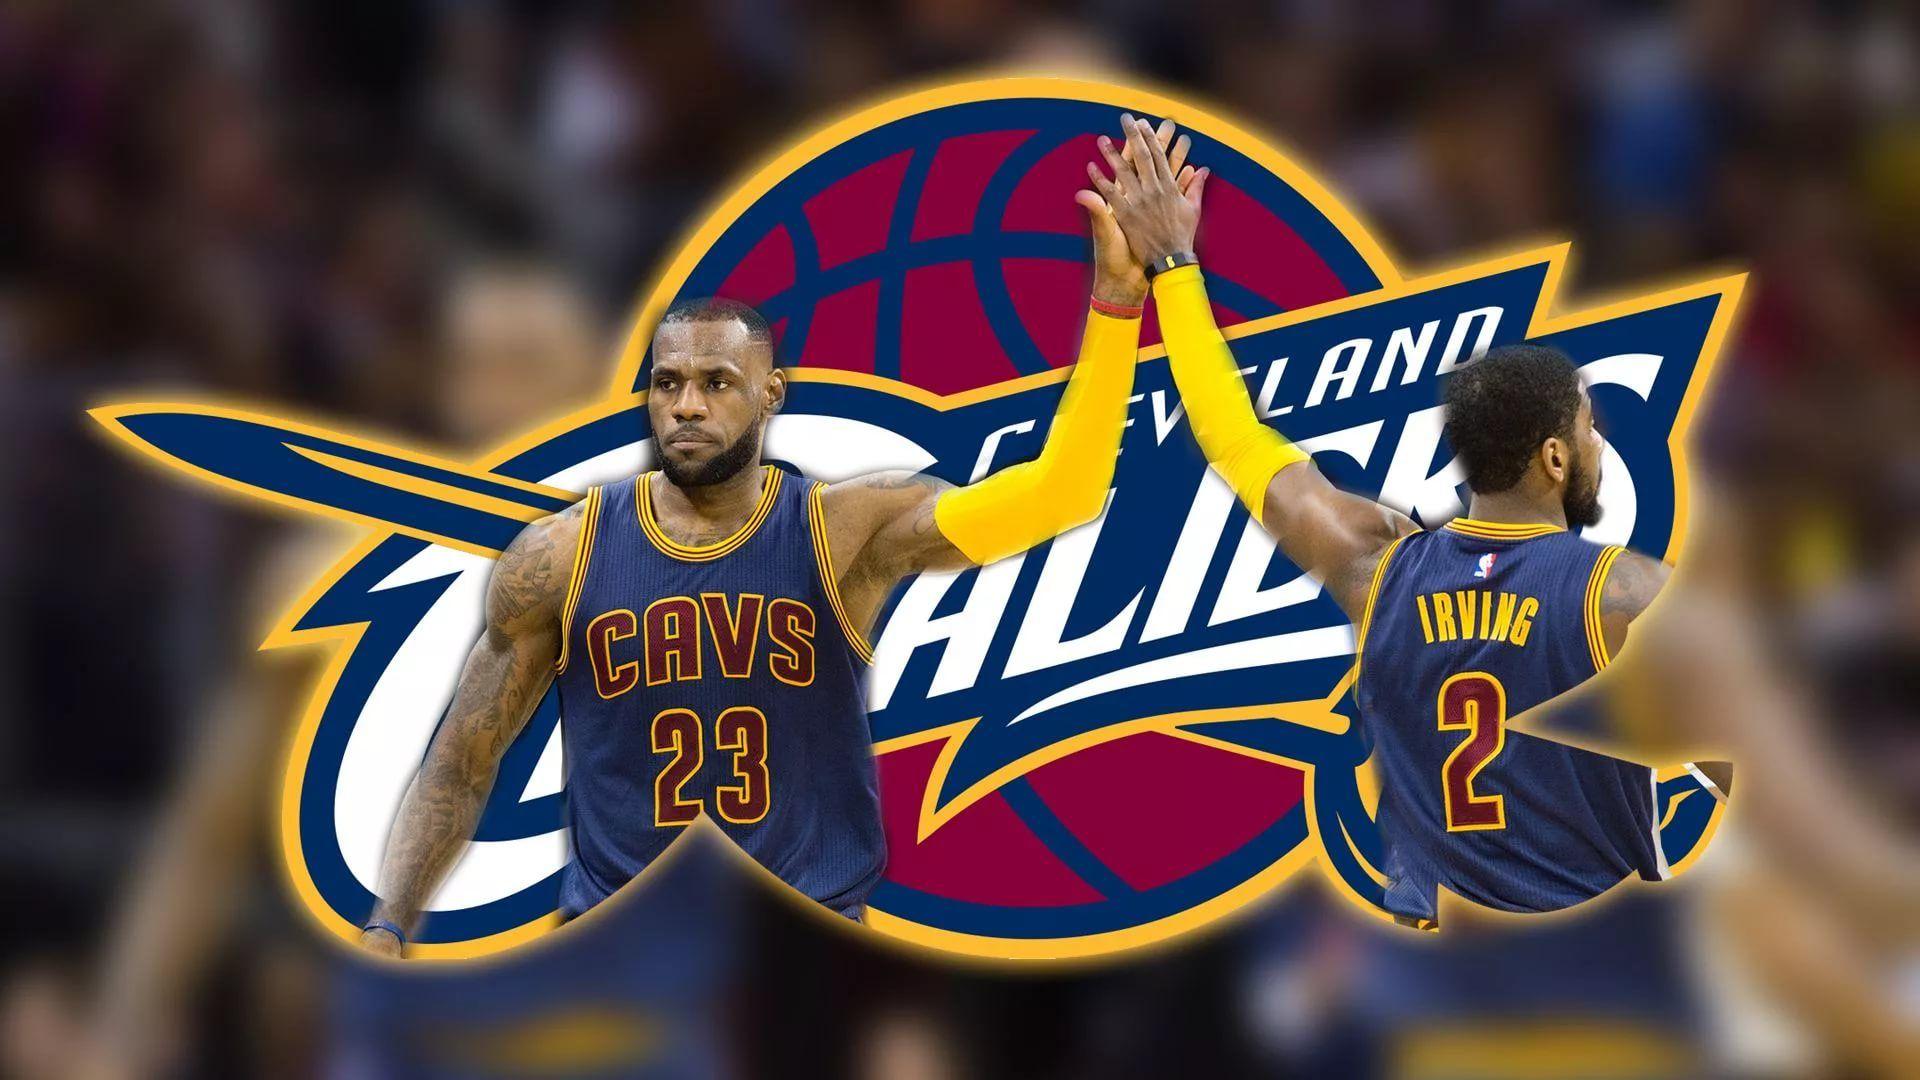 Cleveland full wallpaper